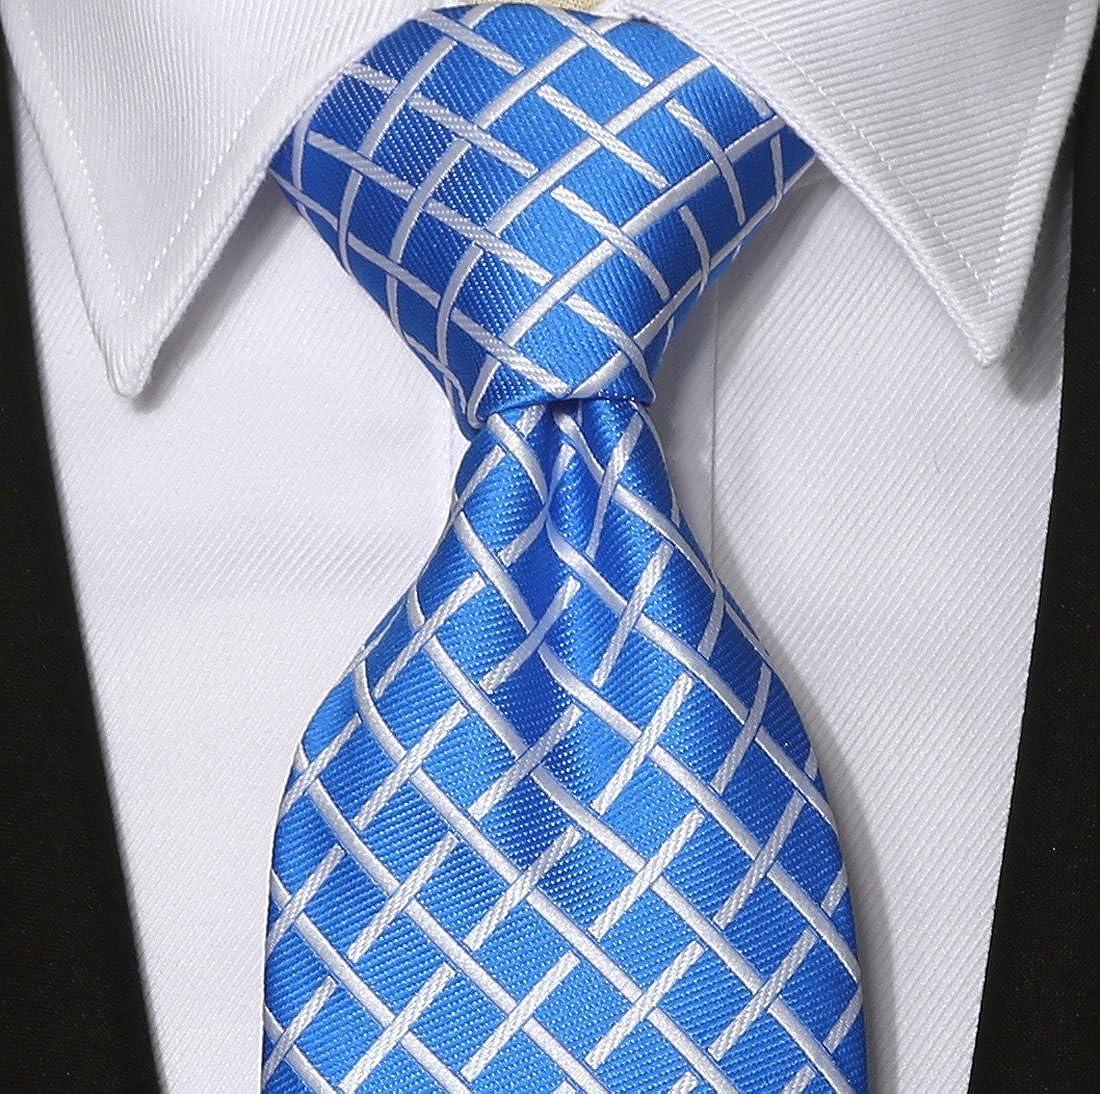 63 XL KissTies Mens Extra Long Tie Checkered Plaid Necktie Gift Box